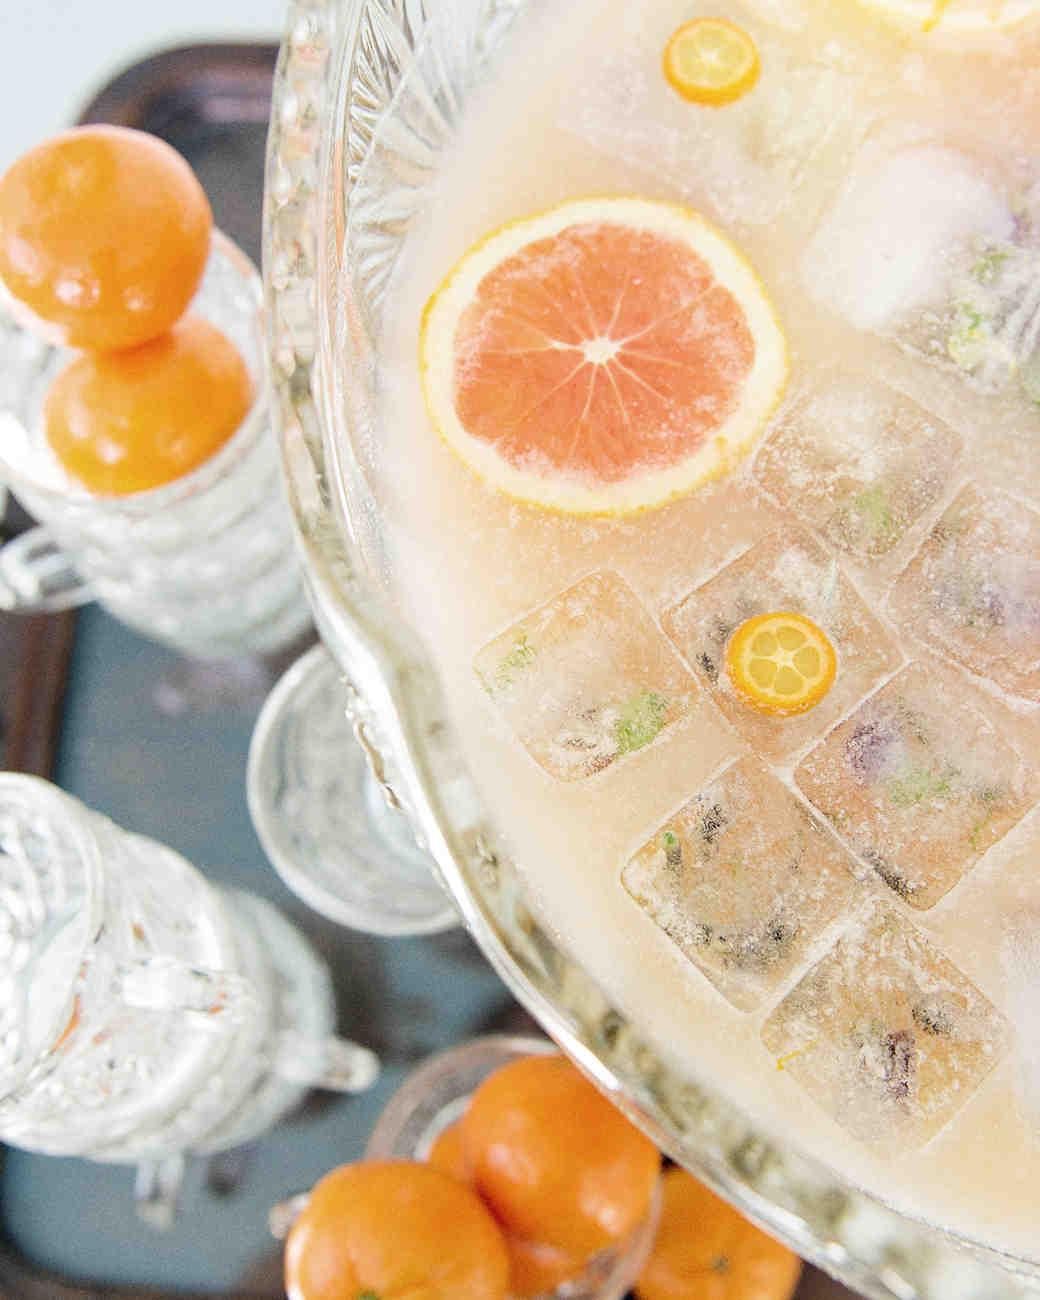 scavenger-hunt-bridal-shower-orange-champagne-punch-with-flower-ice-cubes-0315.jpg